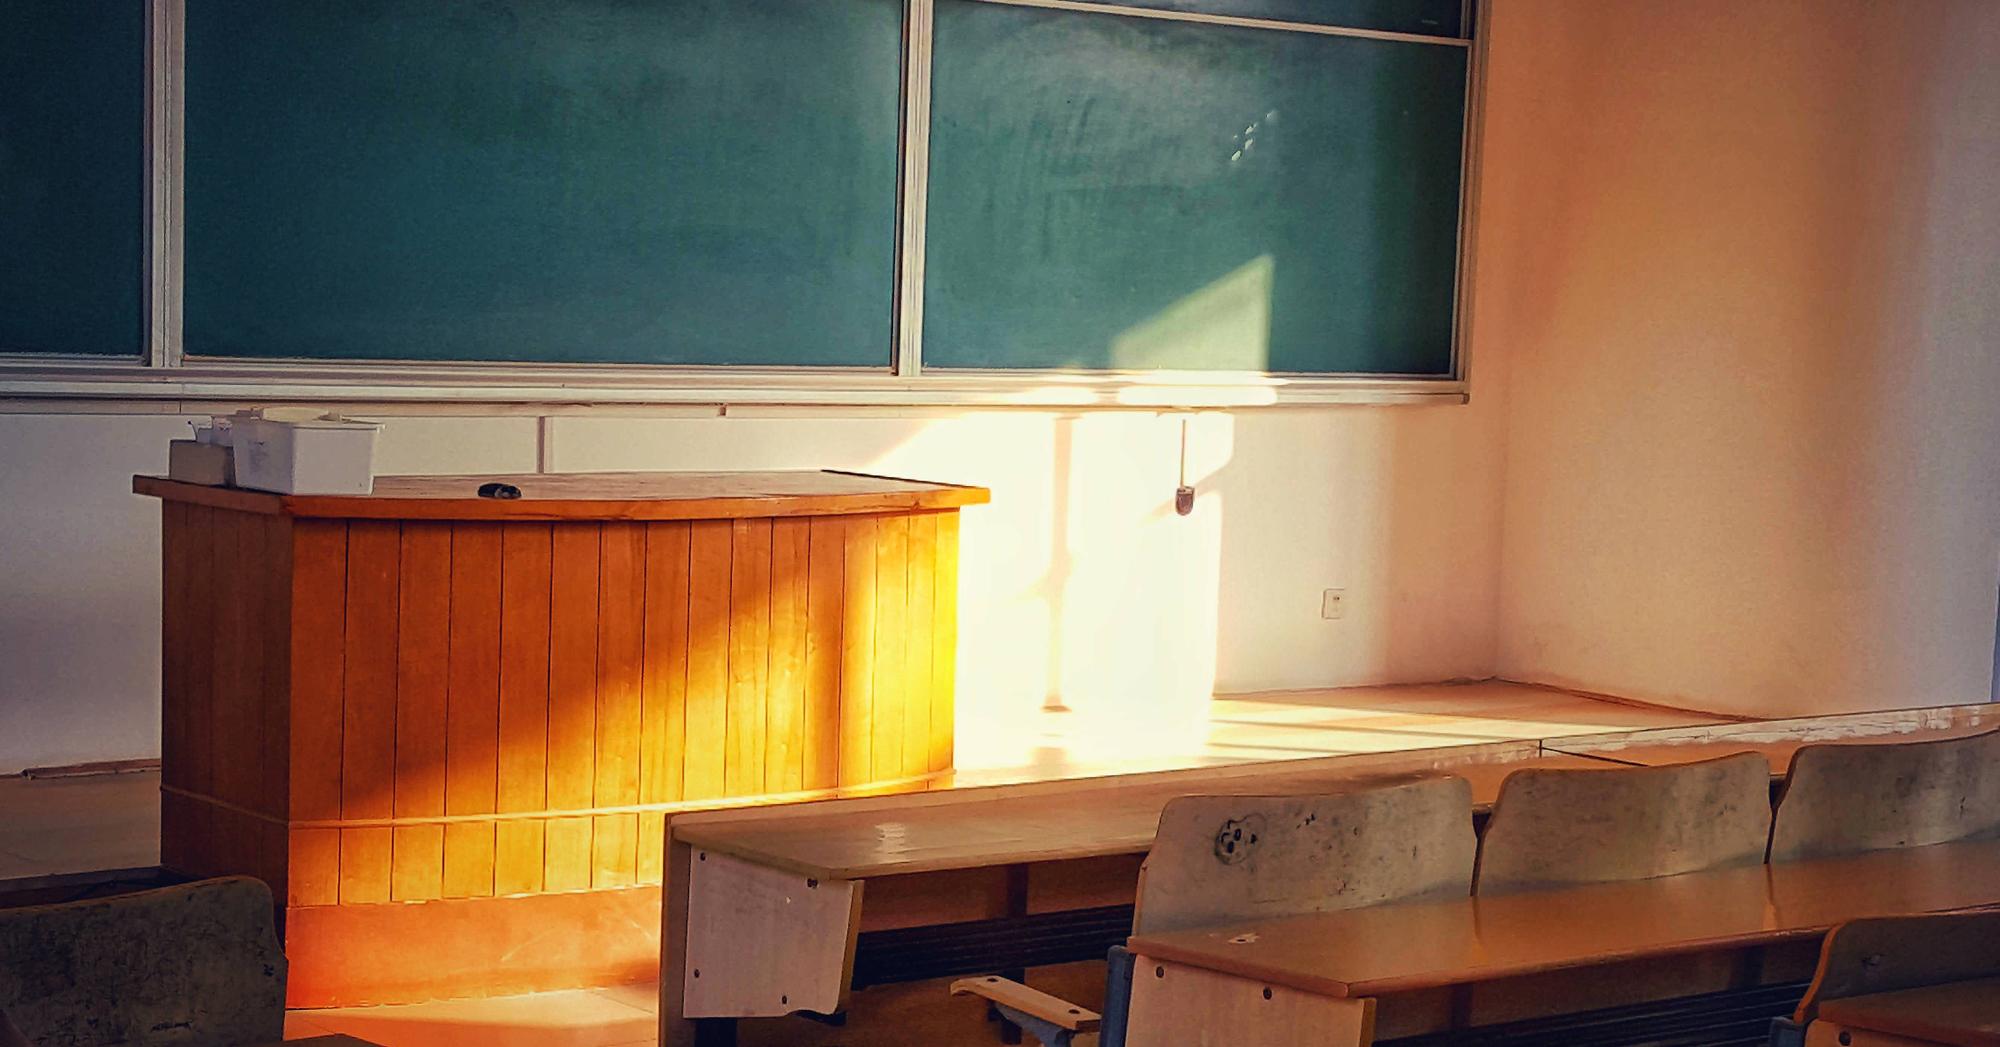 Photo by Barry Zhou (via Unsplash) of a blackboard, teacher's desk and students' desks in an empty classroom with sunlight streaming on the teacher's desk.